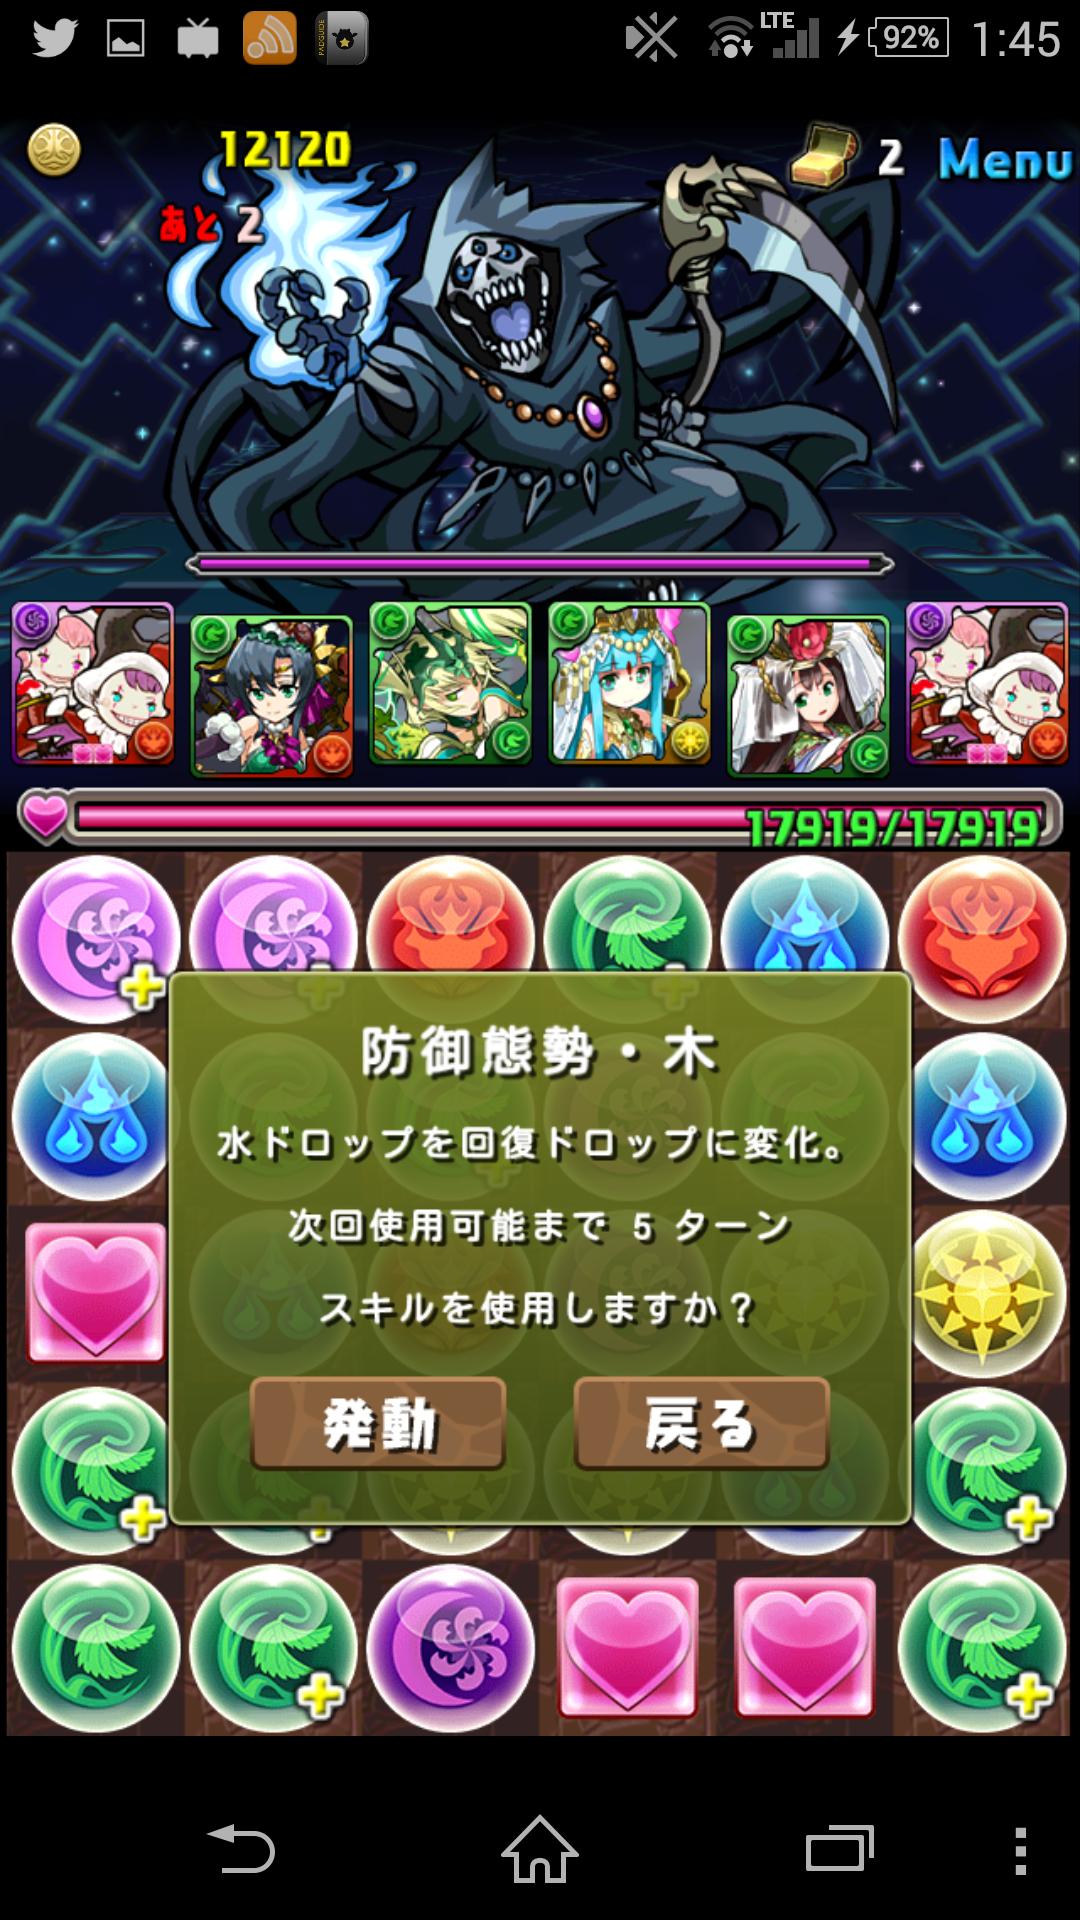 Screenshot_2015-03-04-01-45-35.png